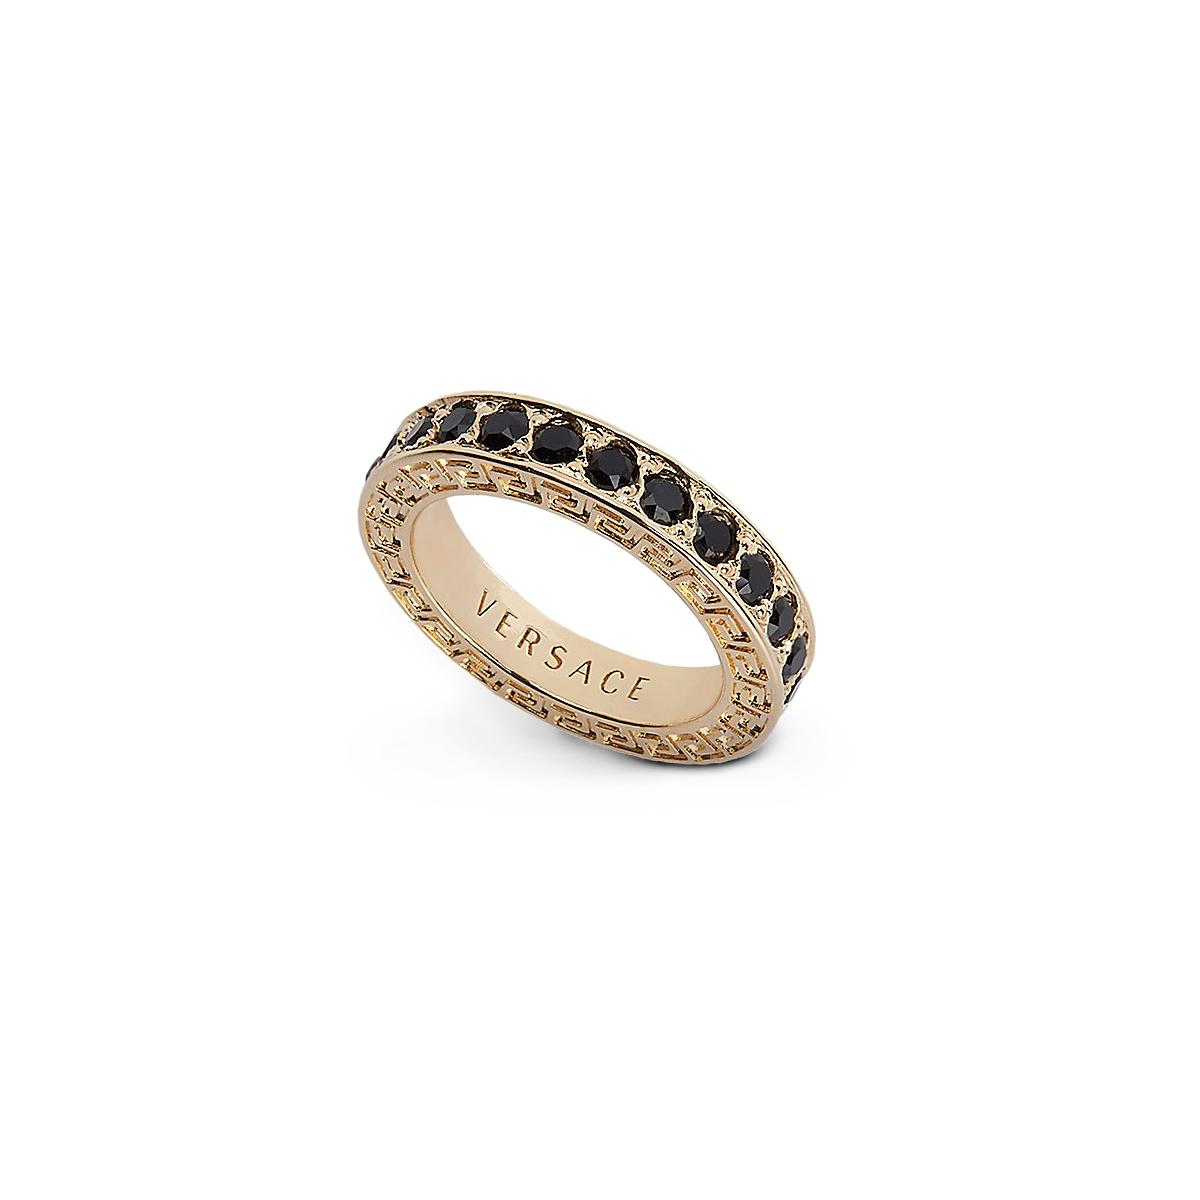 Discover More Versace Pre Fall 2015 Jewellery On JewelryJewelry RingsJewelry